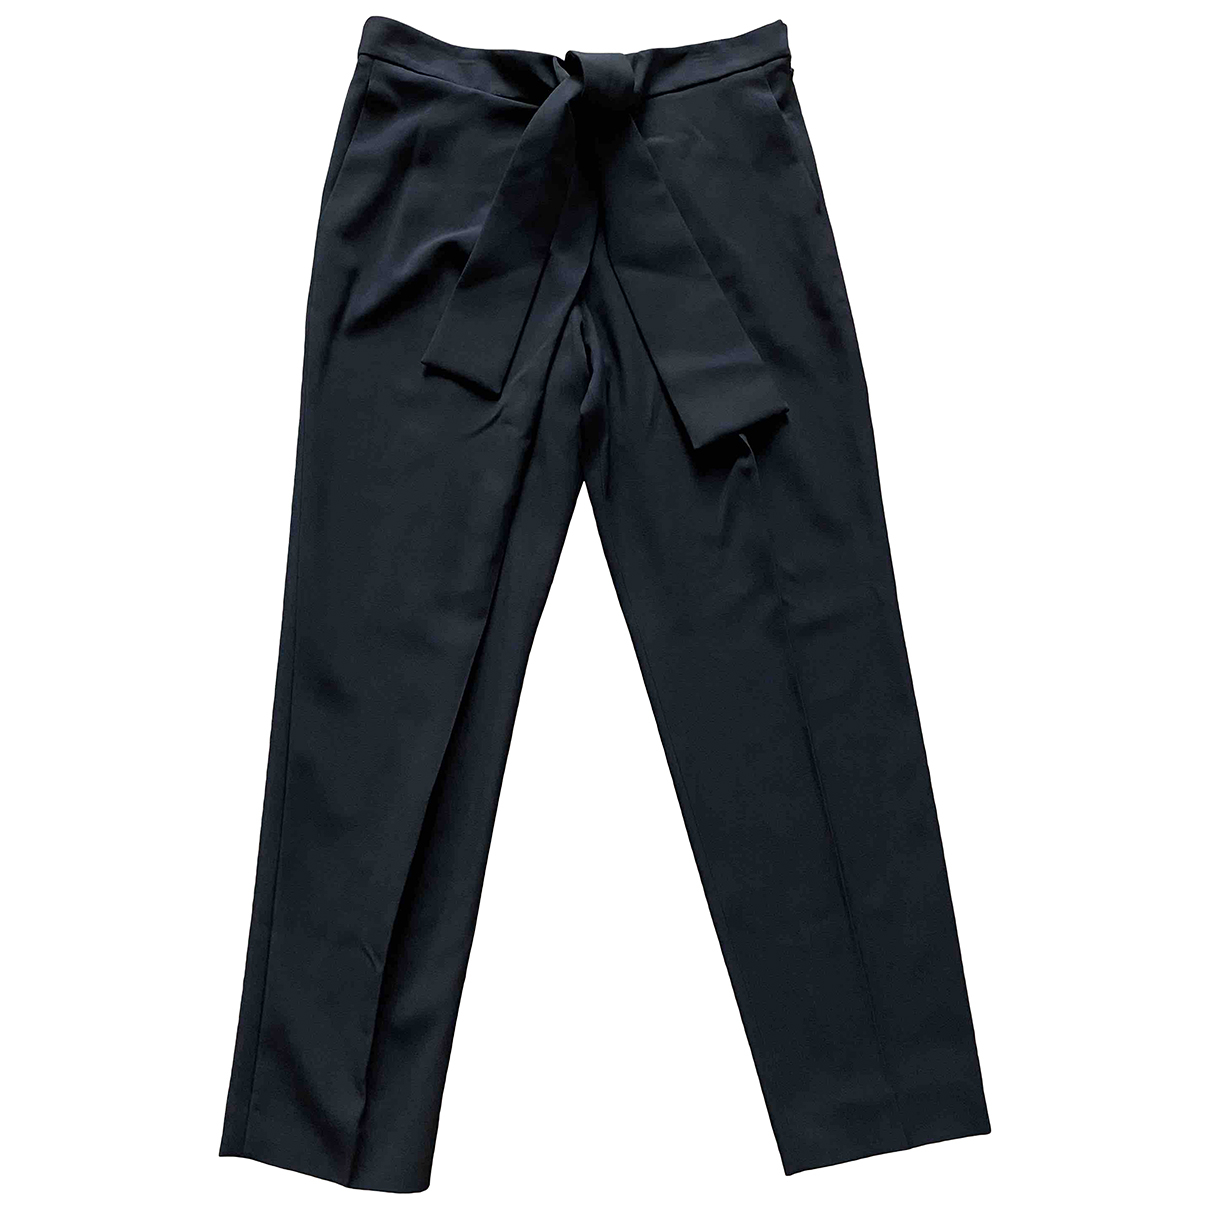 Chloé N Black Trousers for Women 42 FR